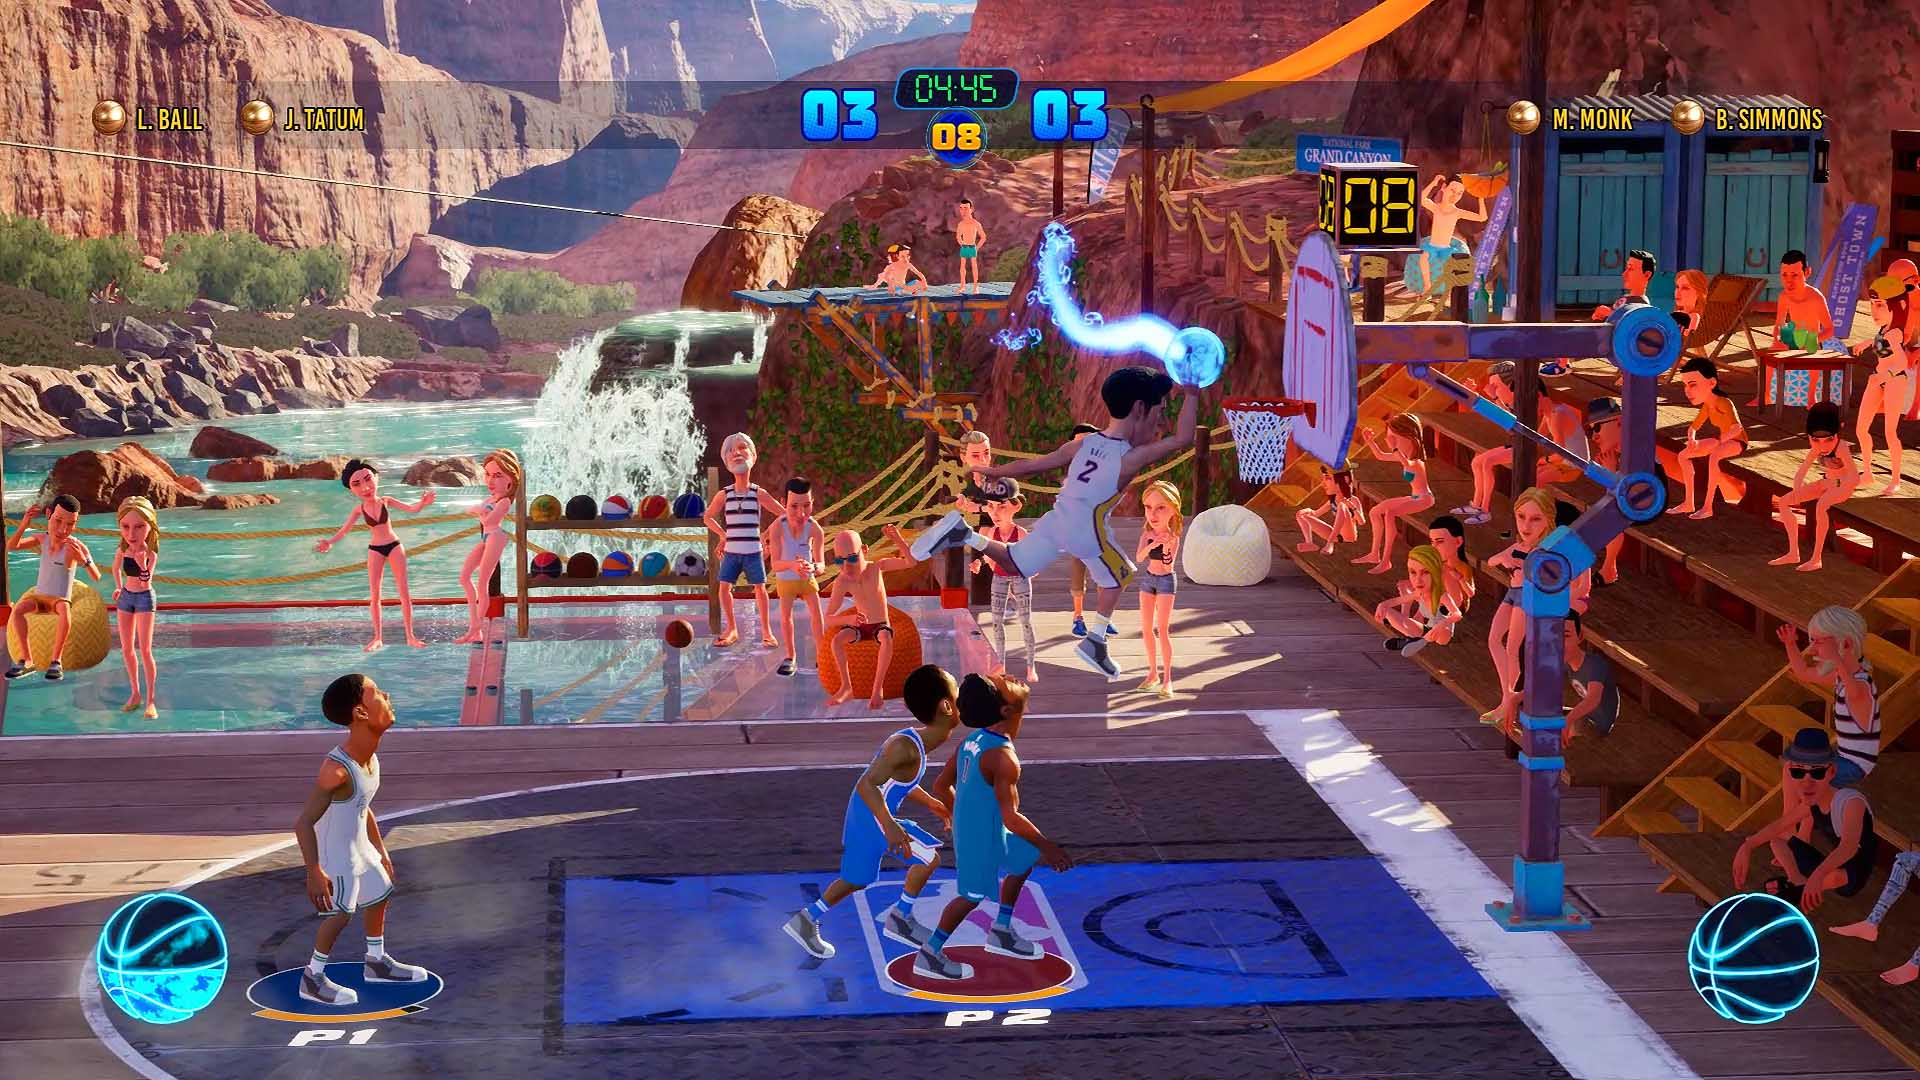 Análisis de NBA Playgrounds 2 - Xbox One 1